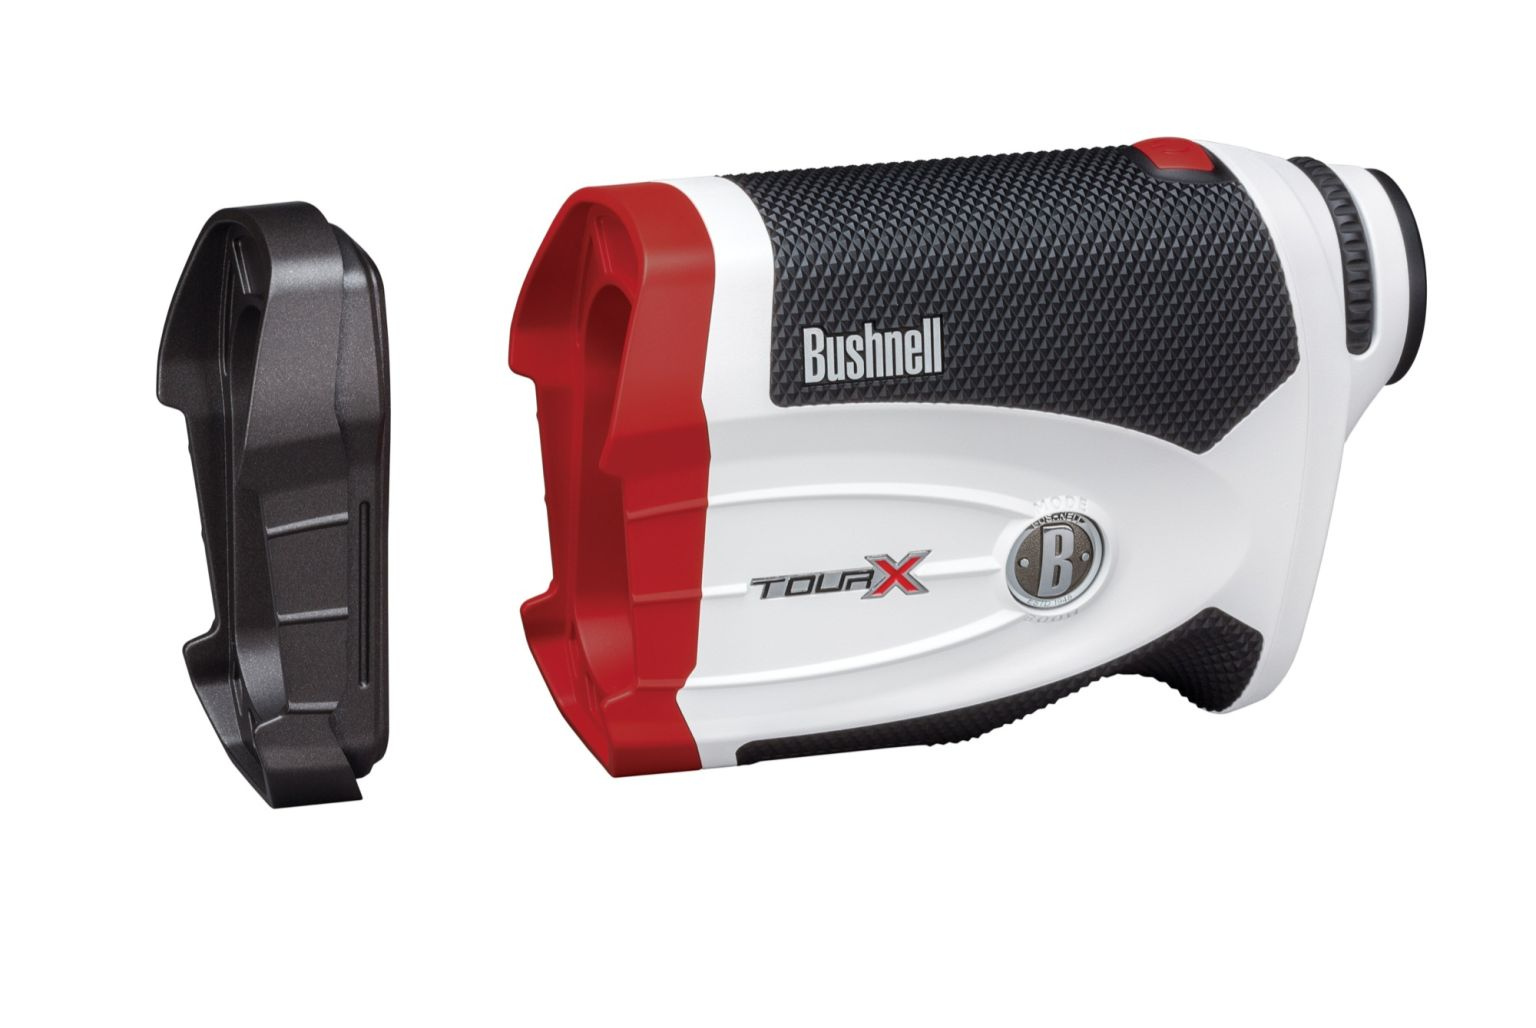 Bushnell Entfernungsmesser Golf : Bushnell tour jolt laser entfernungsmessgerät golf